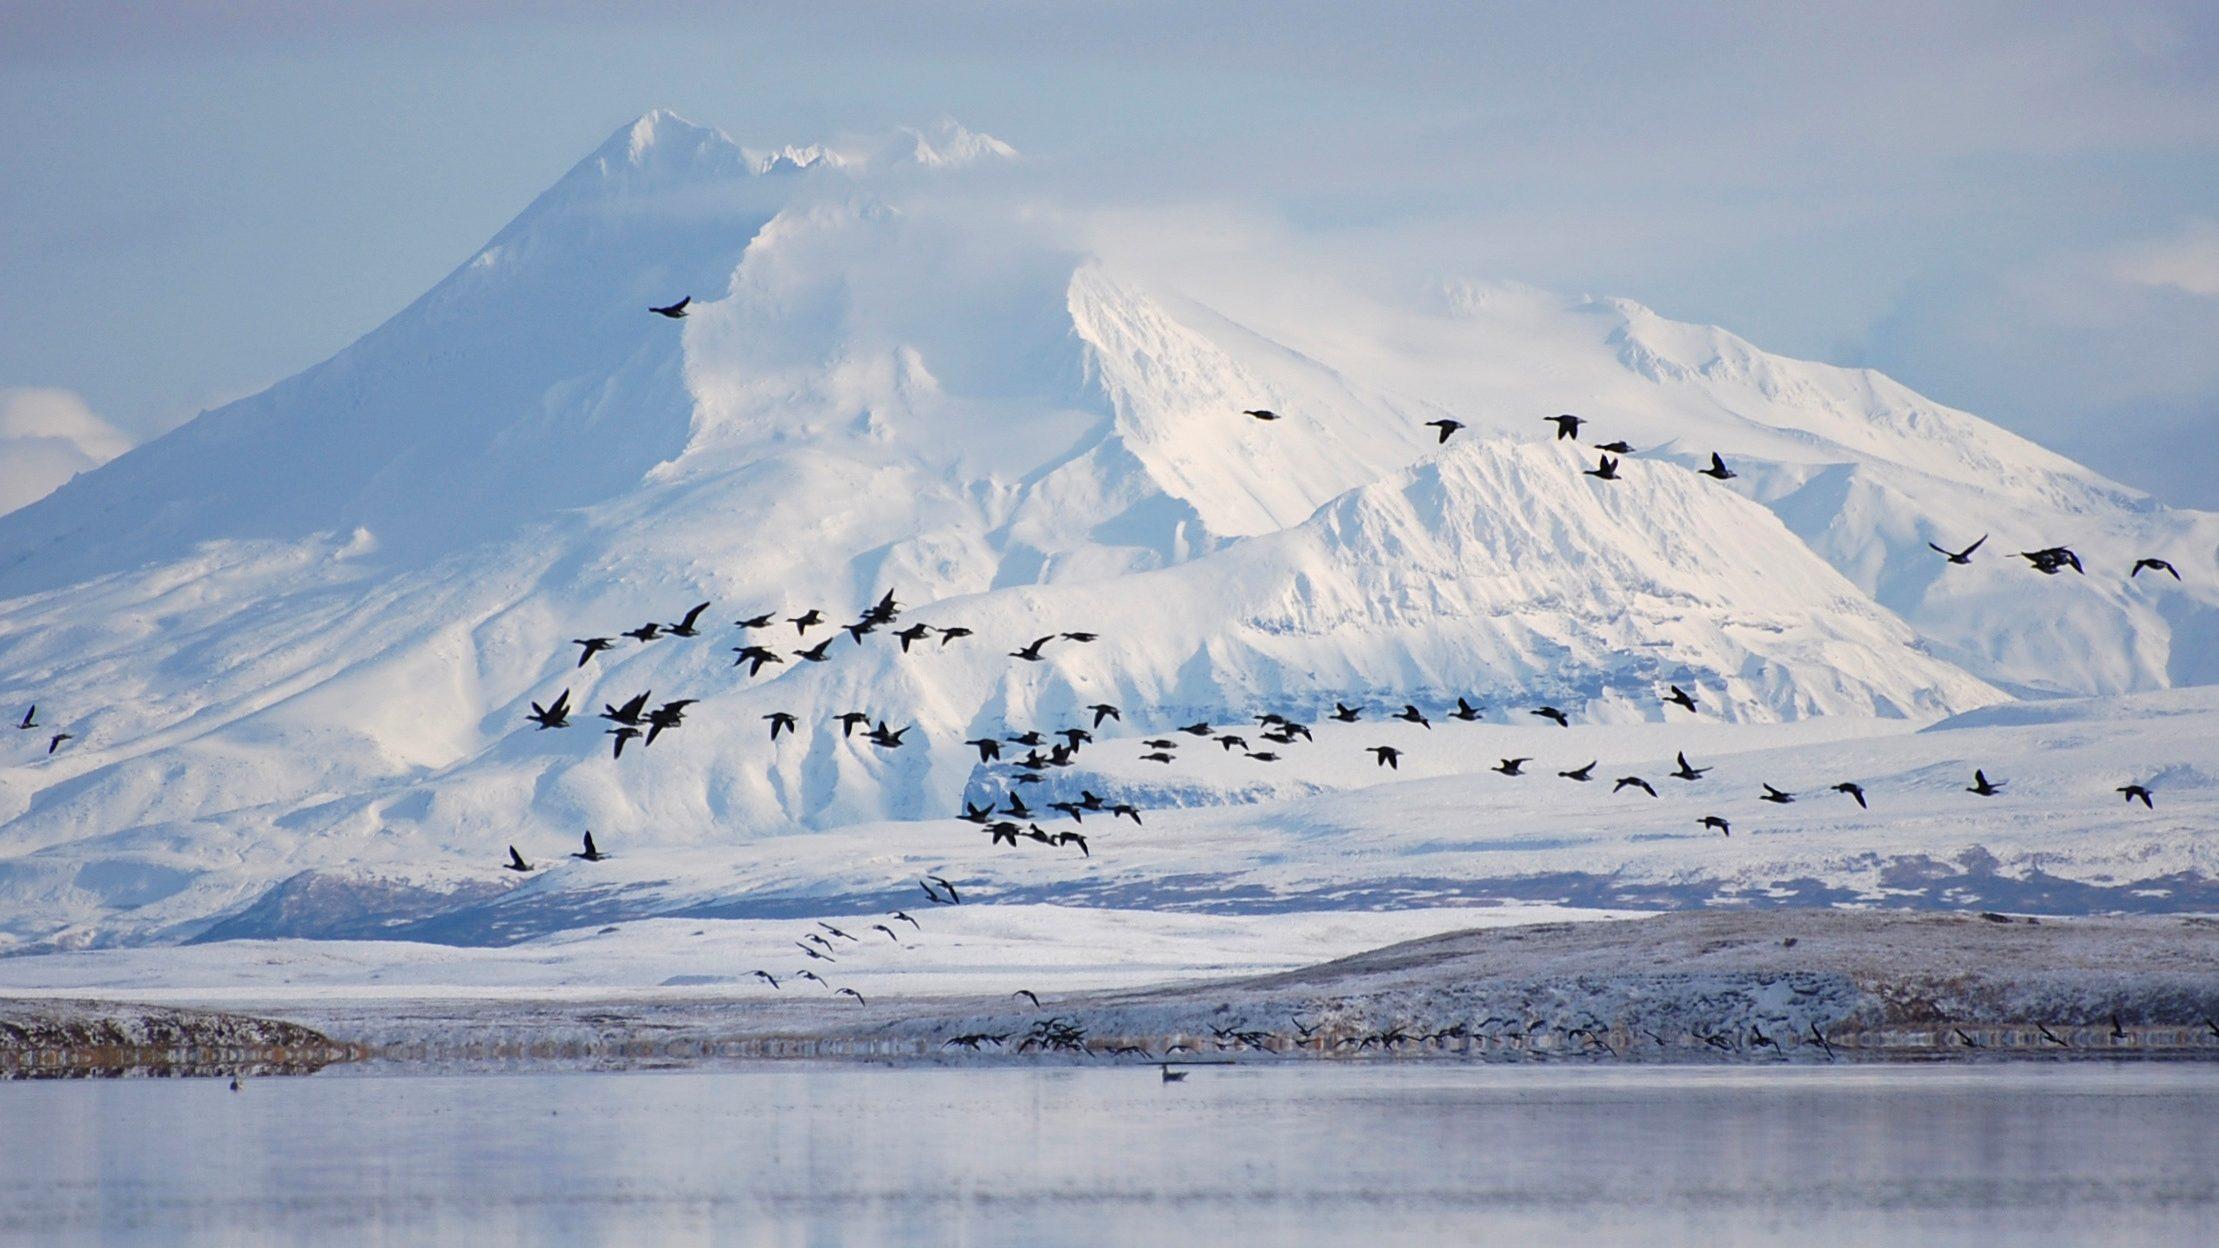 Pacific black brant fly past Mount Dutton over the Izembek Lagoon in the Izembek National Wildlife Refuge in Alaska's Aleutian Islands